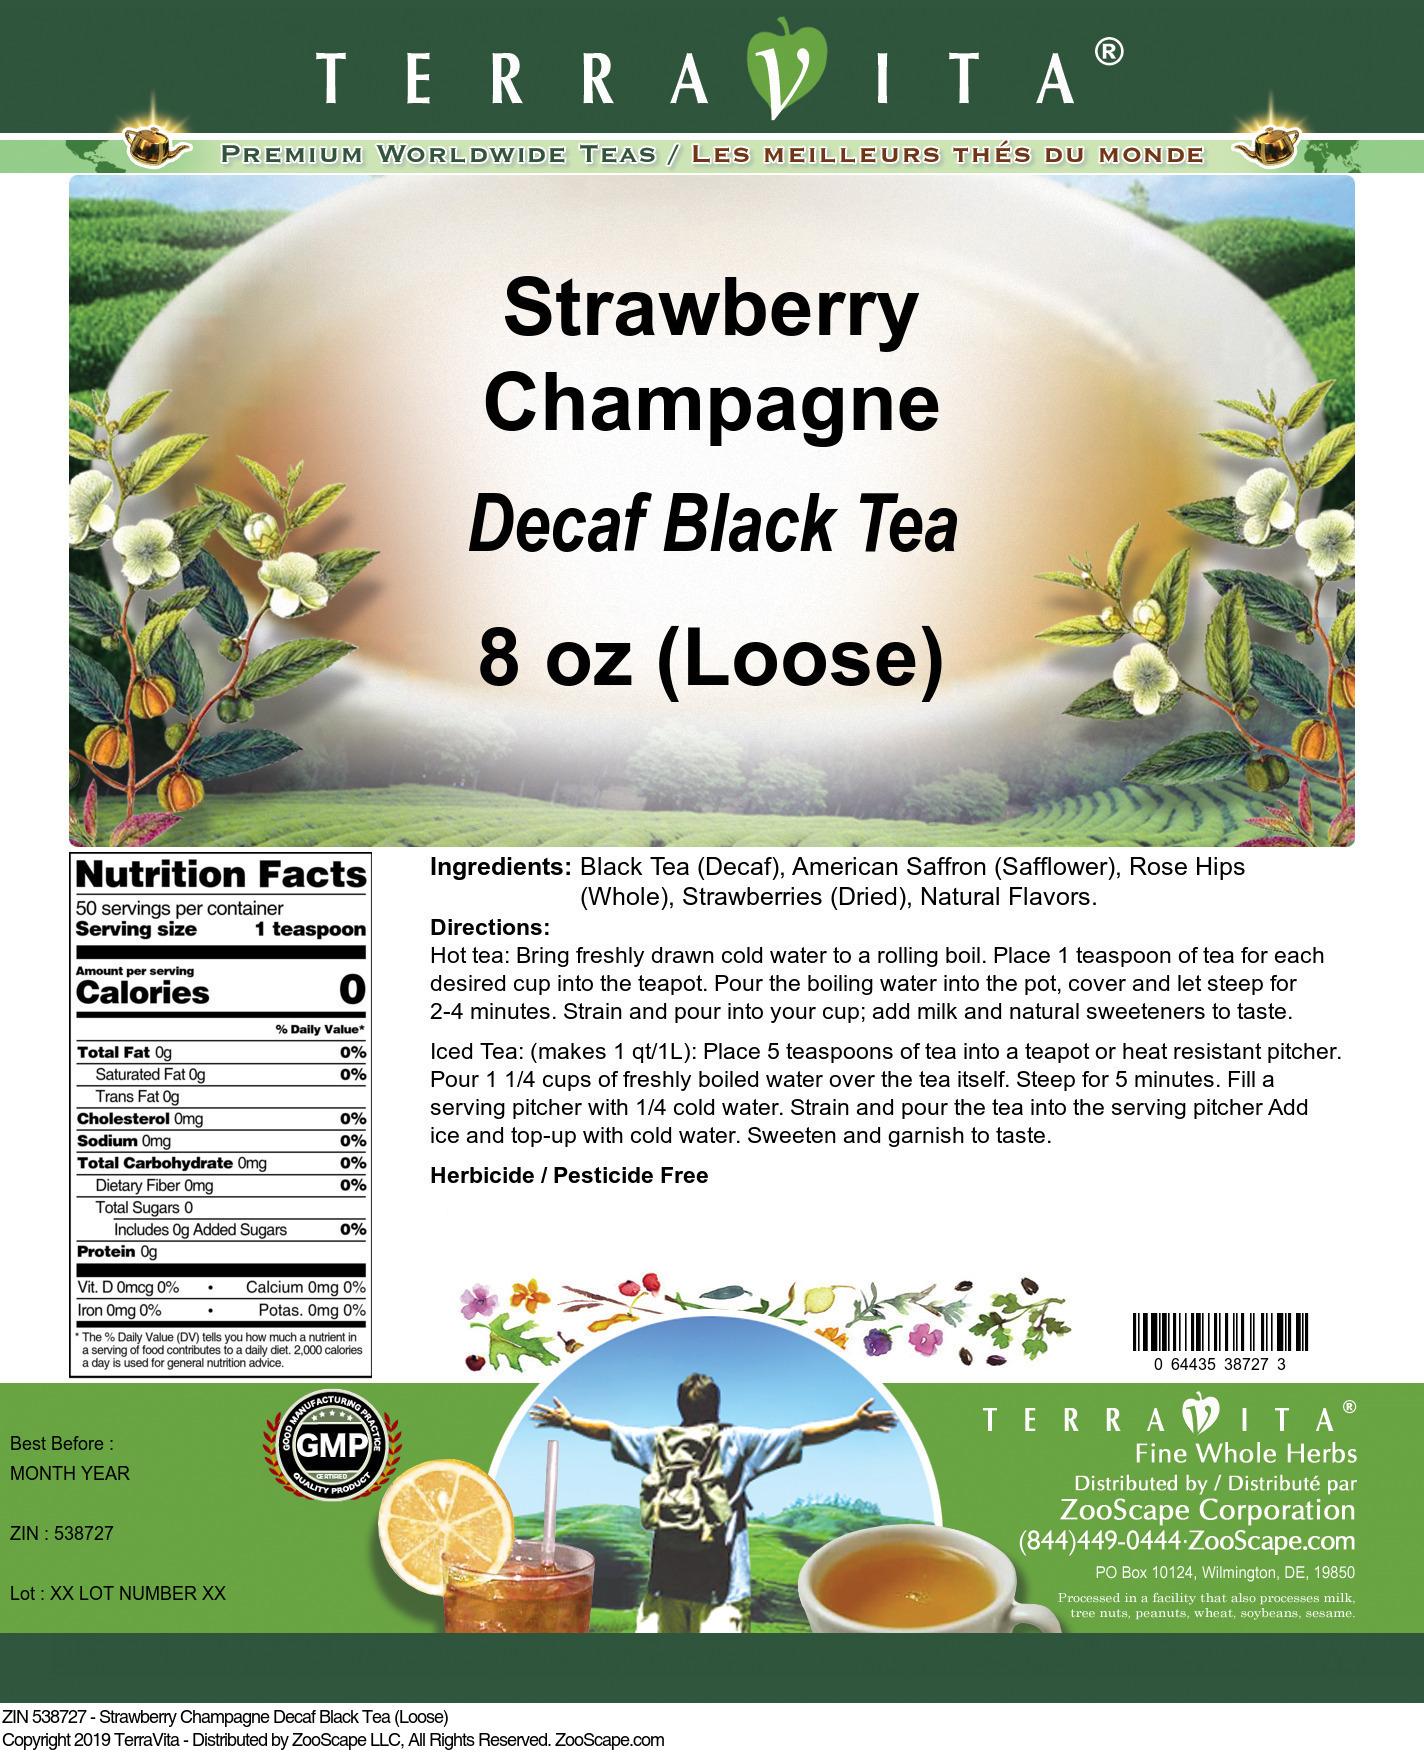 Strawberry Champagne Decaf Black Tea (Loose)